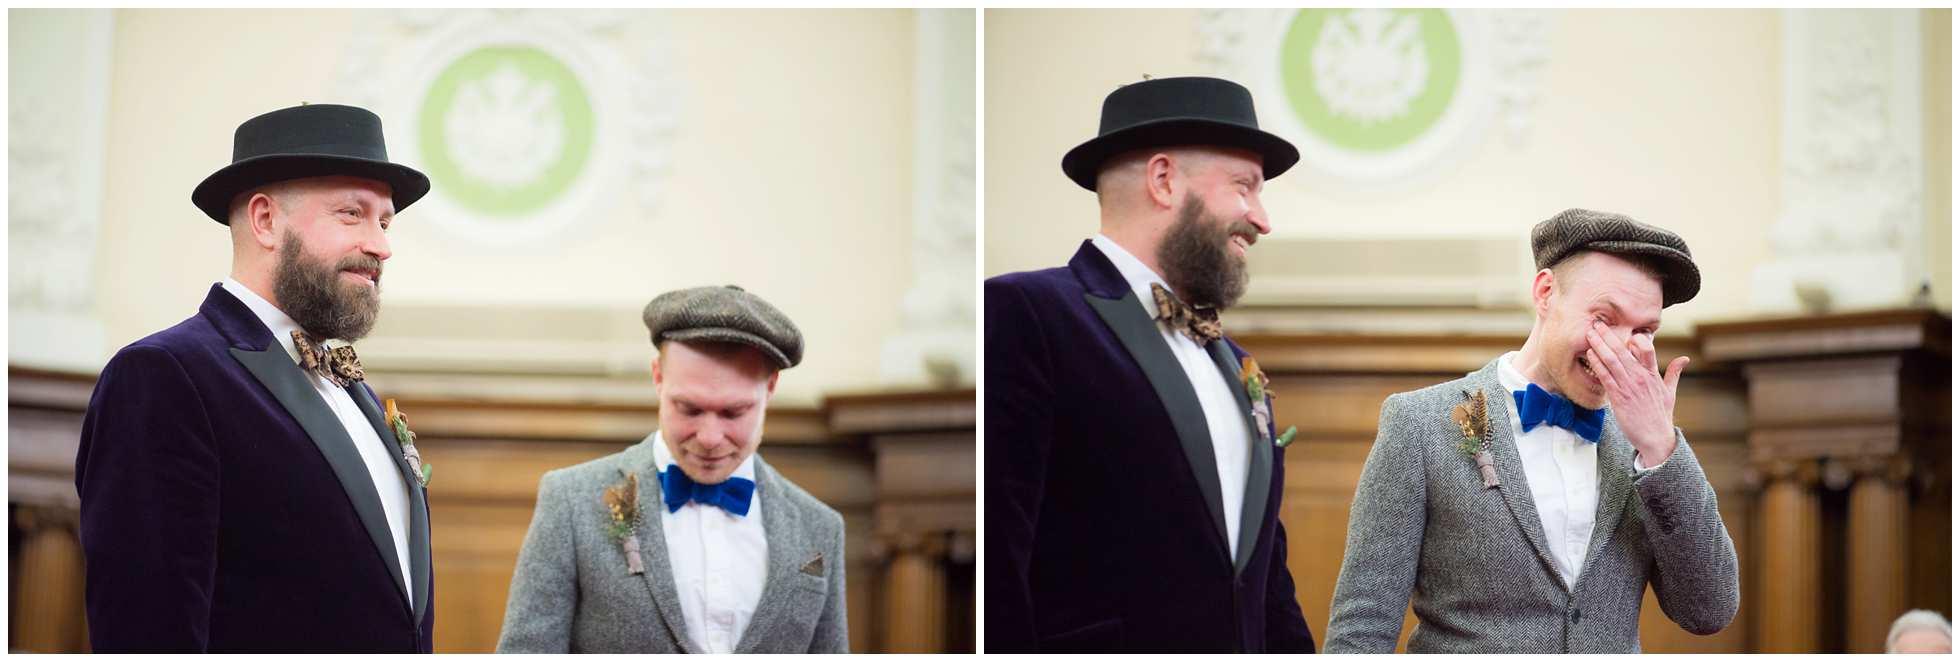 yet more tears gay wedding photography islington town hall